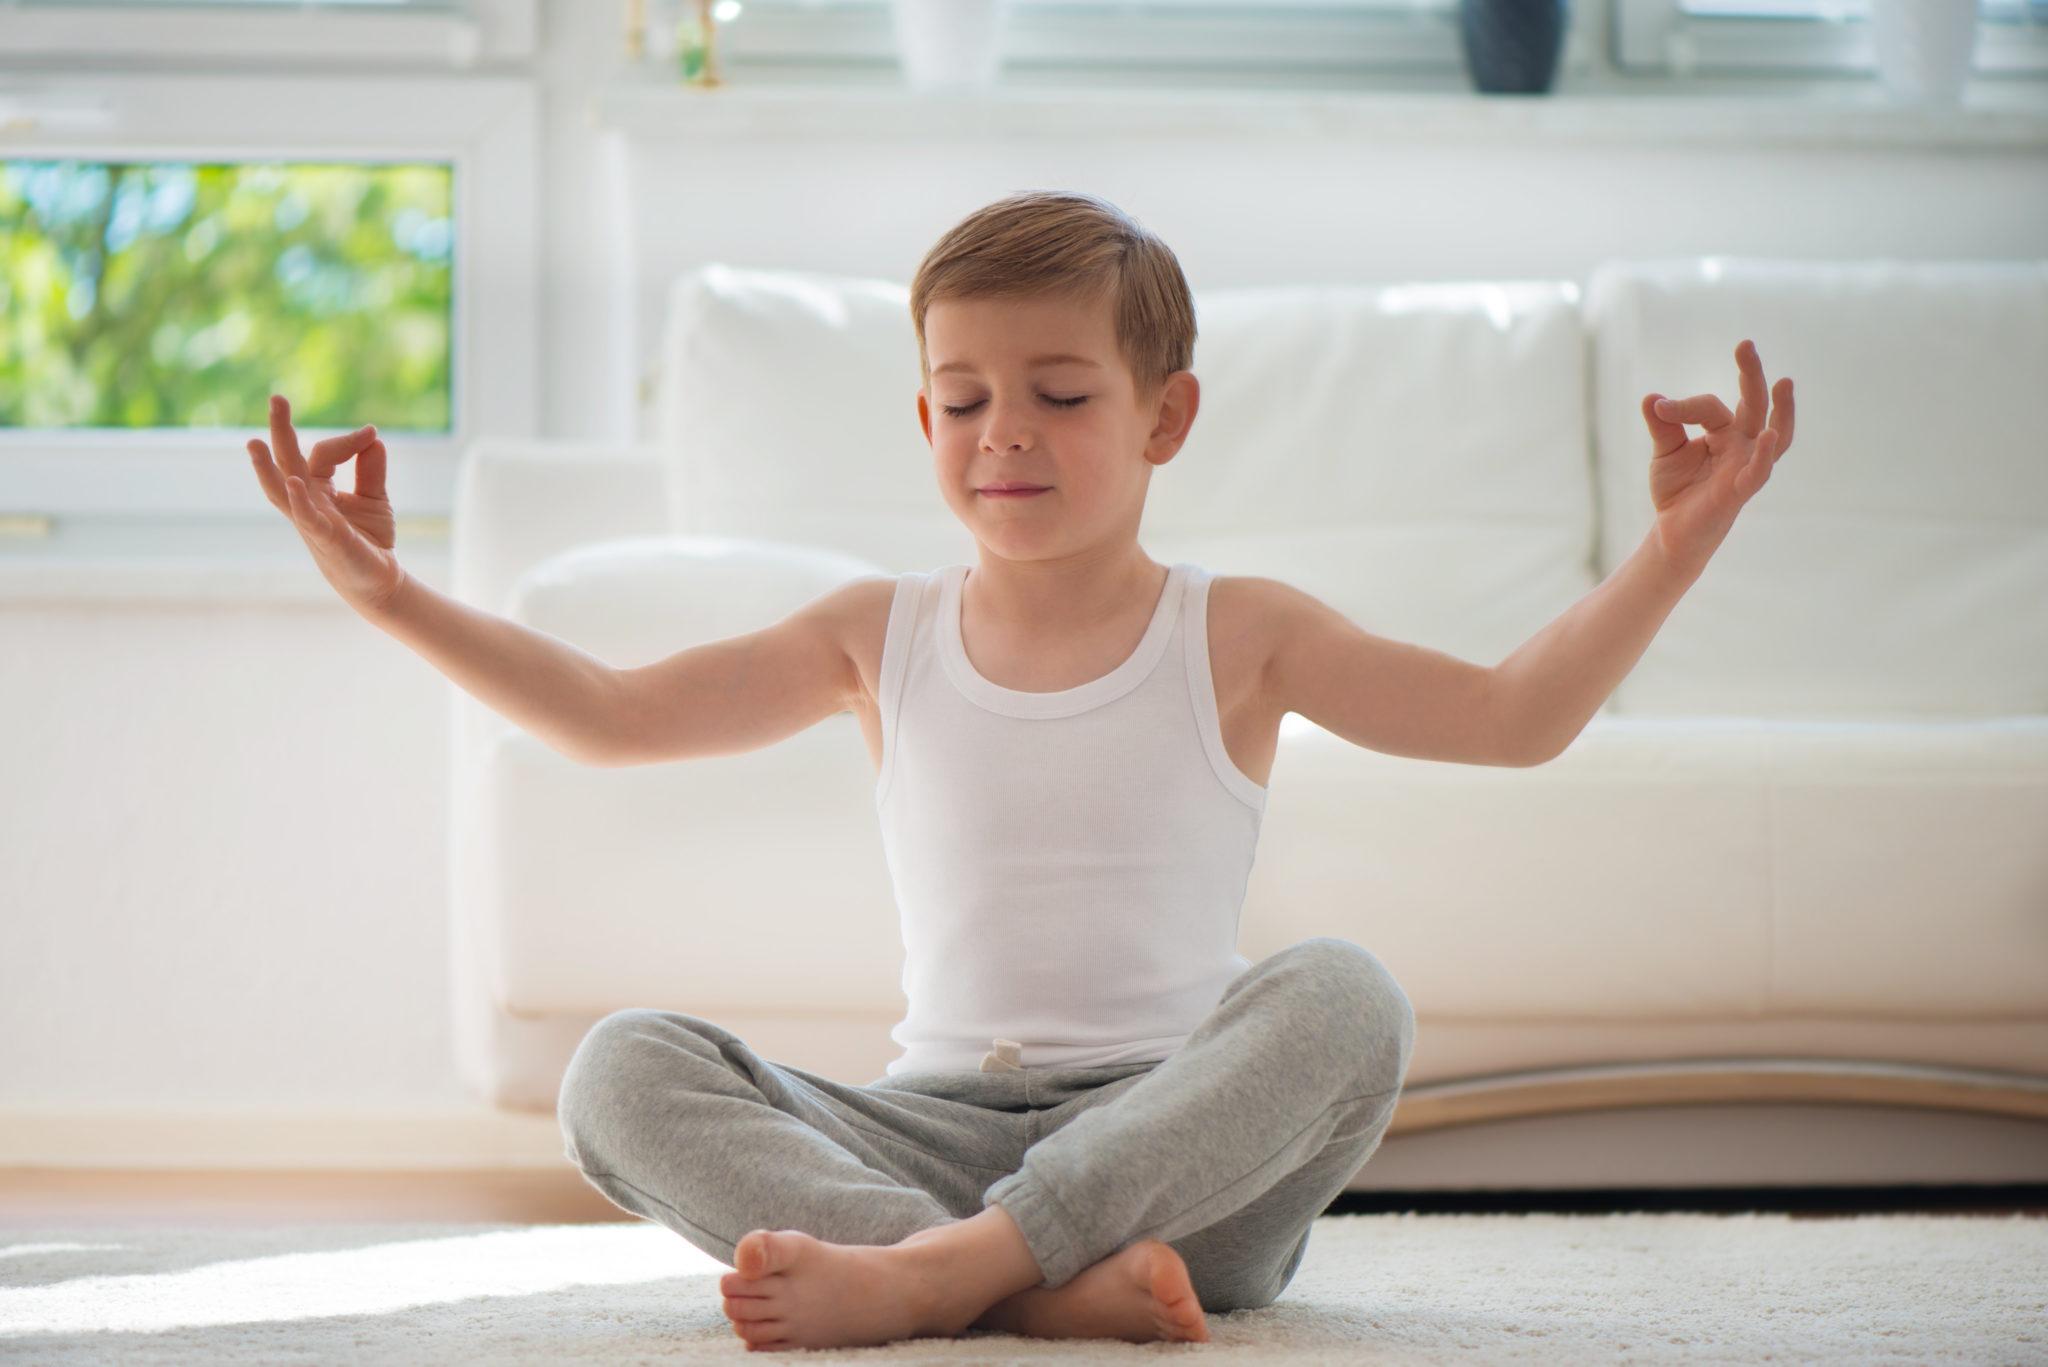 Kinder-Yoga-ist-fuer-alle-da-Bub-entpannt-sich-bei-täglicher-Yoga-Praxisnn